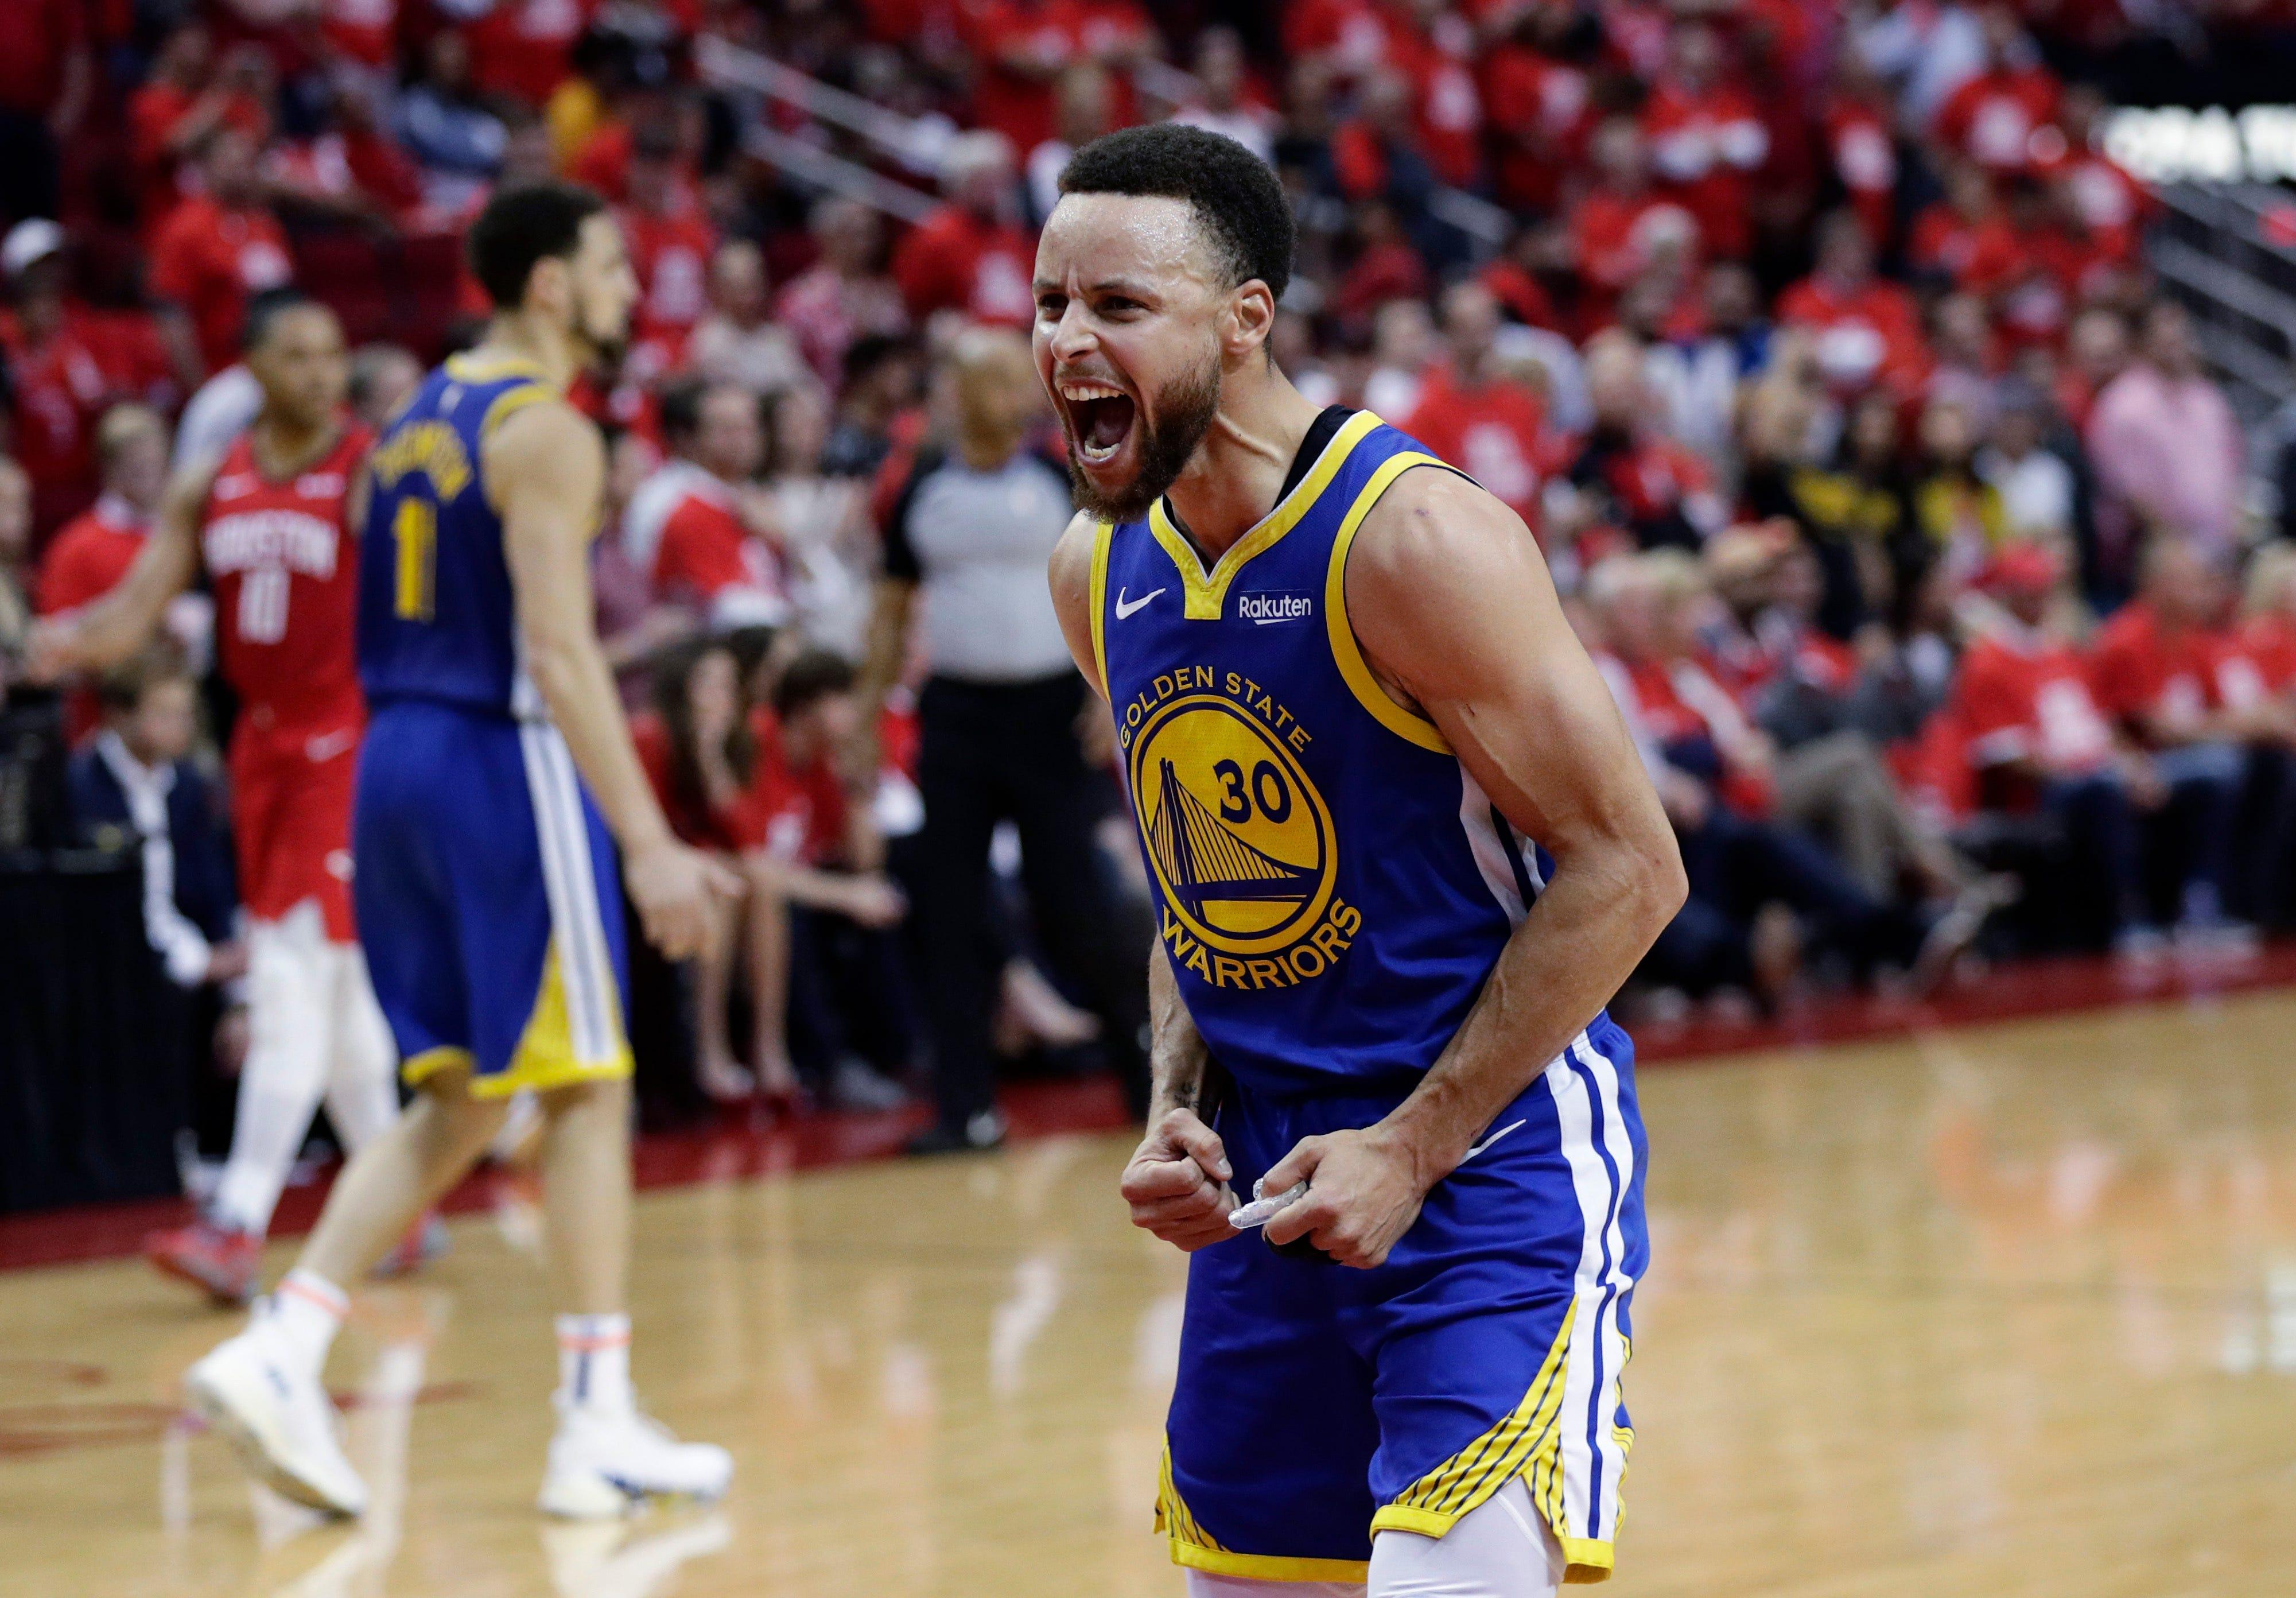 cb4965a4c4cf NBA playoffs  Curry has huge second half as Warriors eliminate Rockets